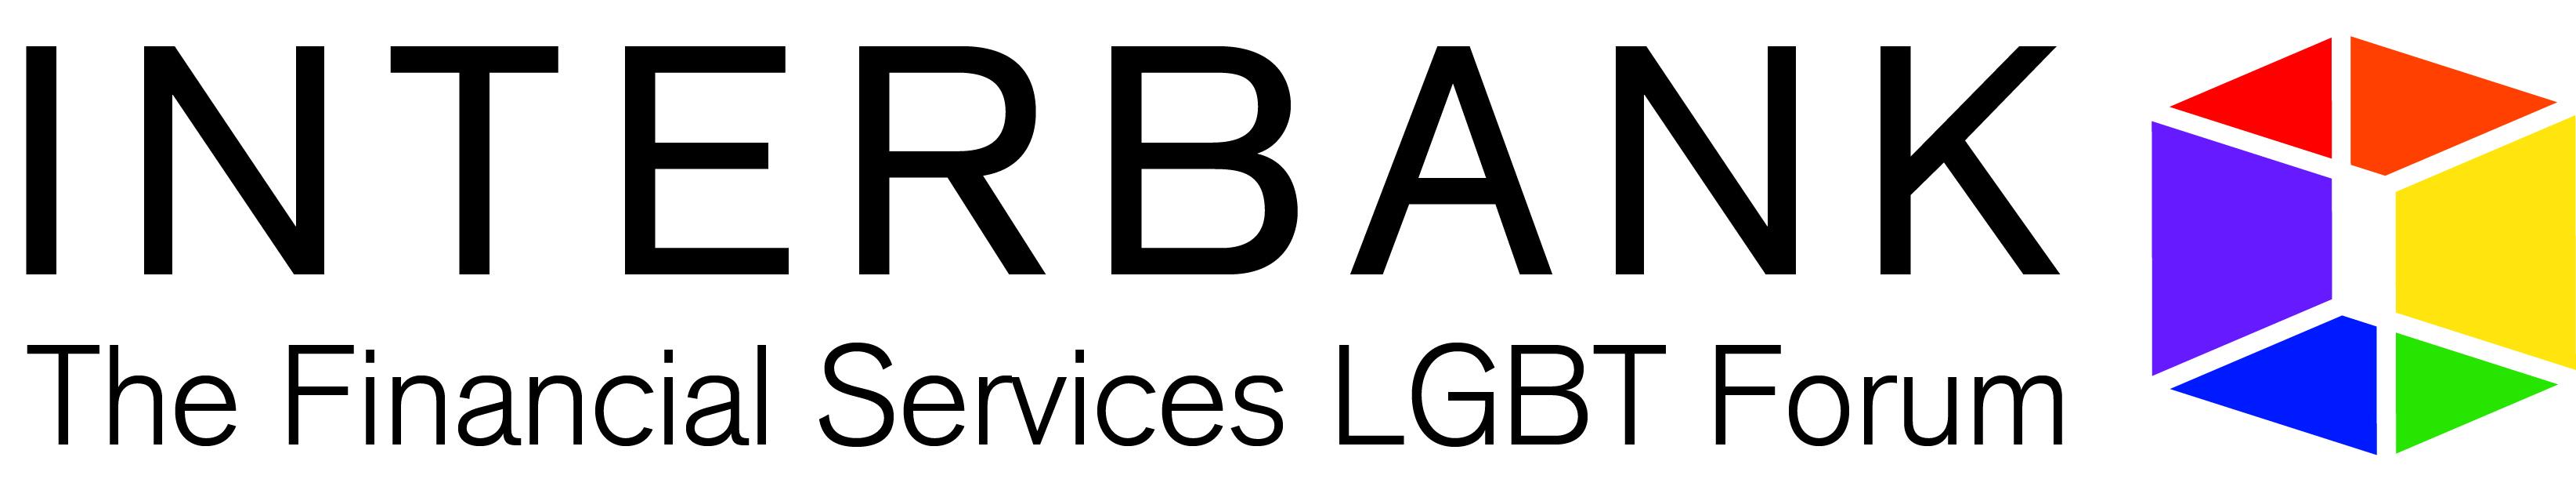 Interbank_logo_cmyk